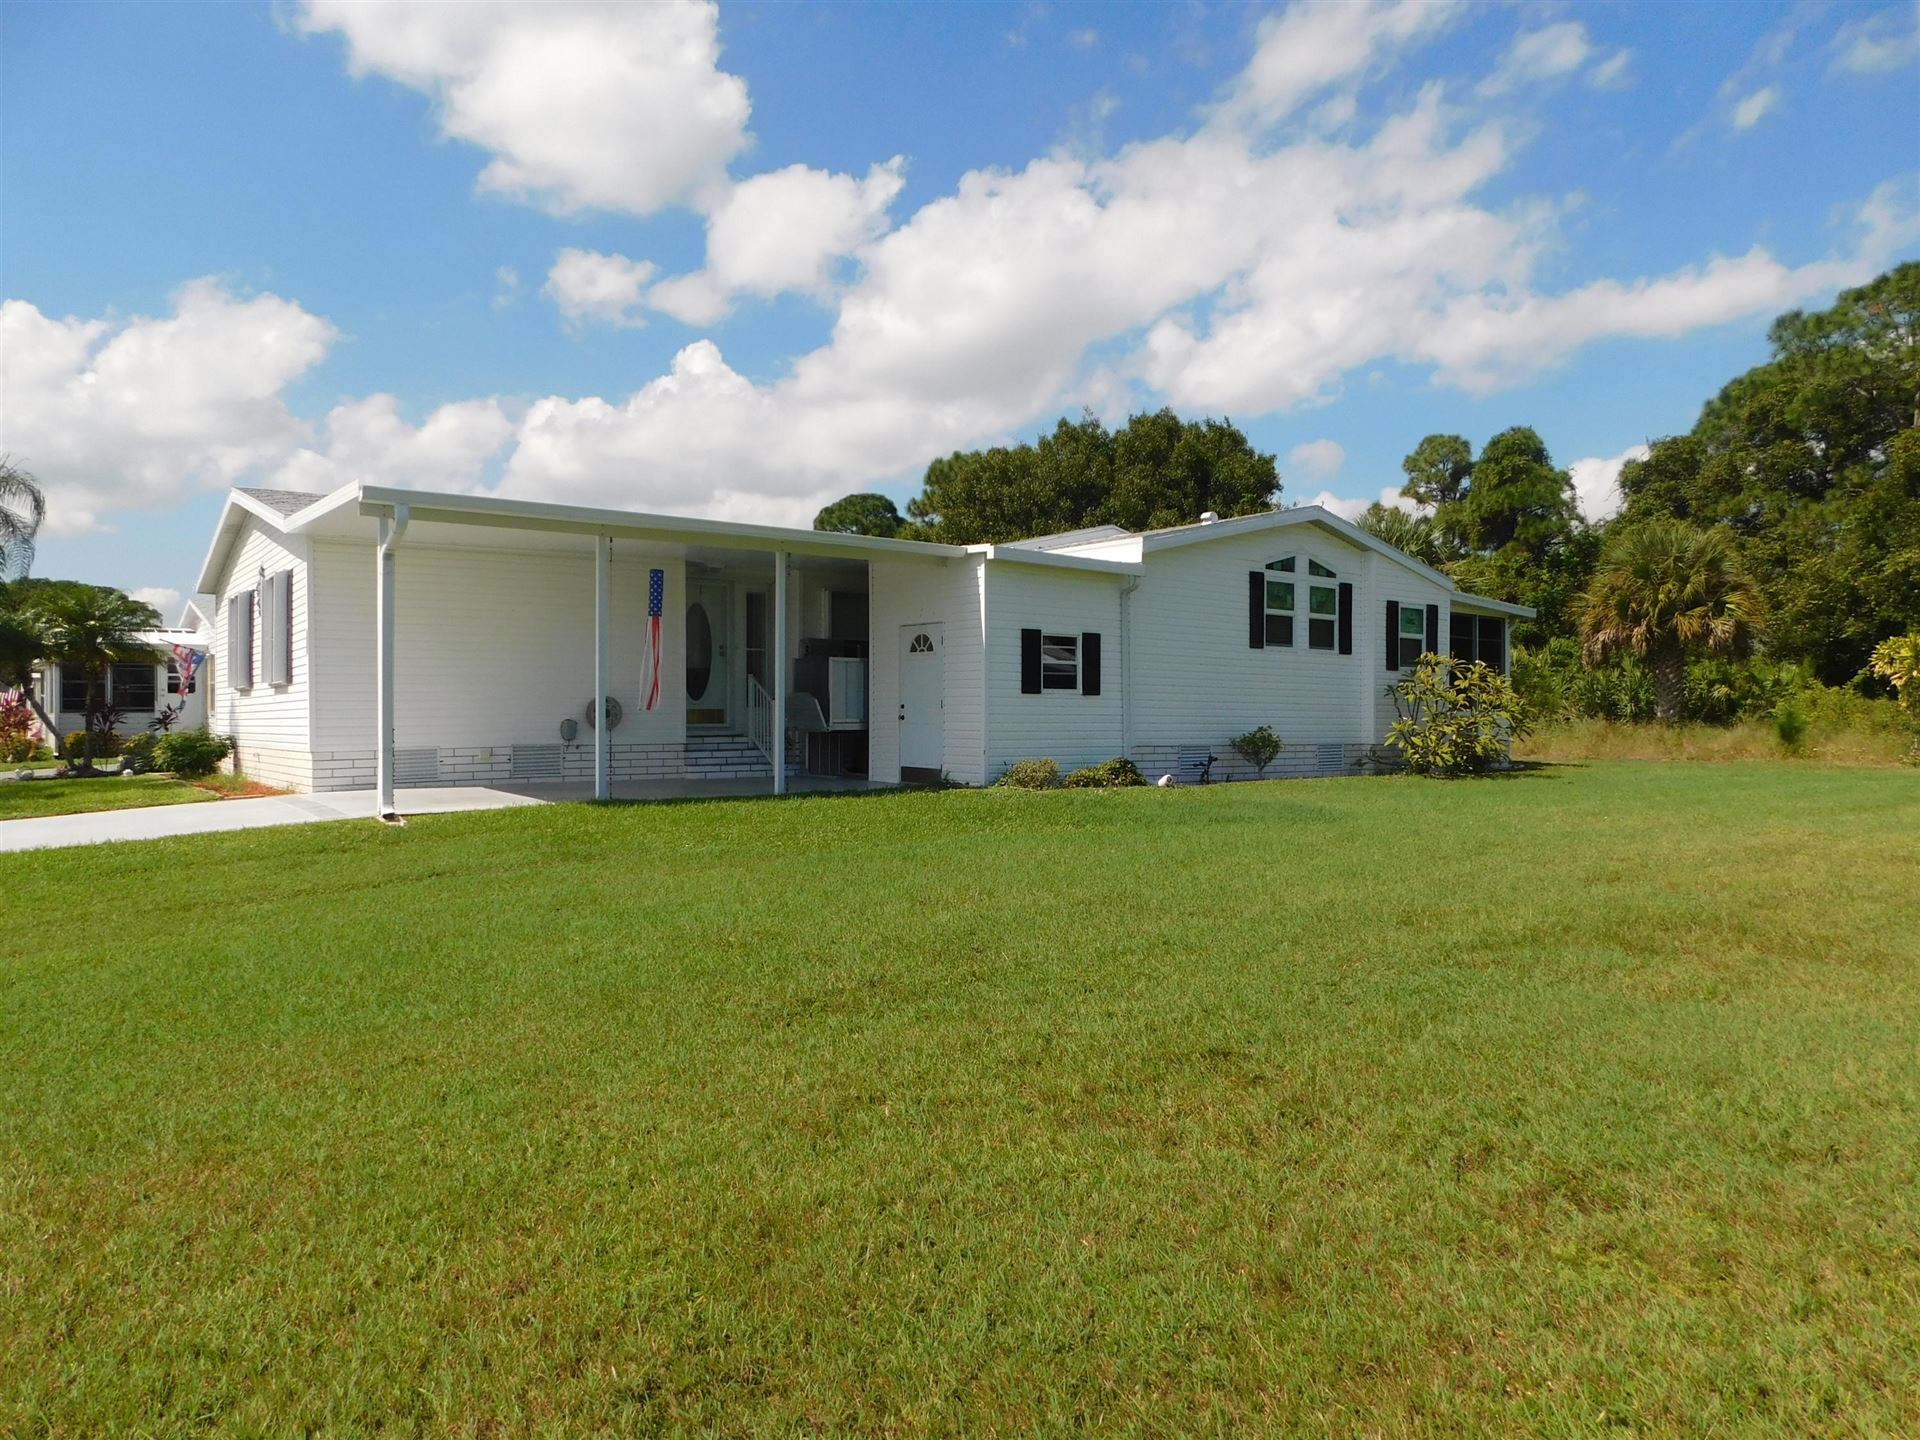 288 W Old Key West Place W, Fort Pierce, FL 34982 - #: RX-10663078